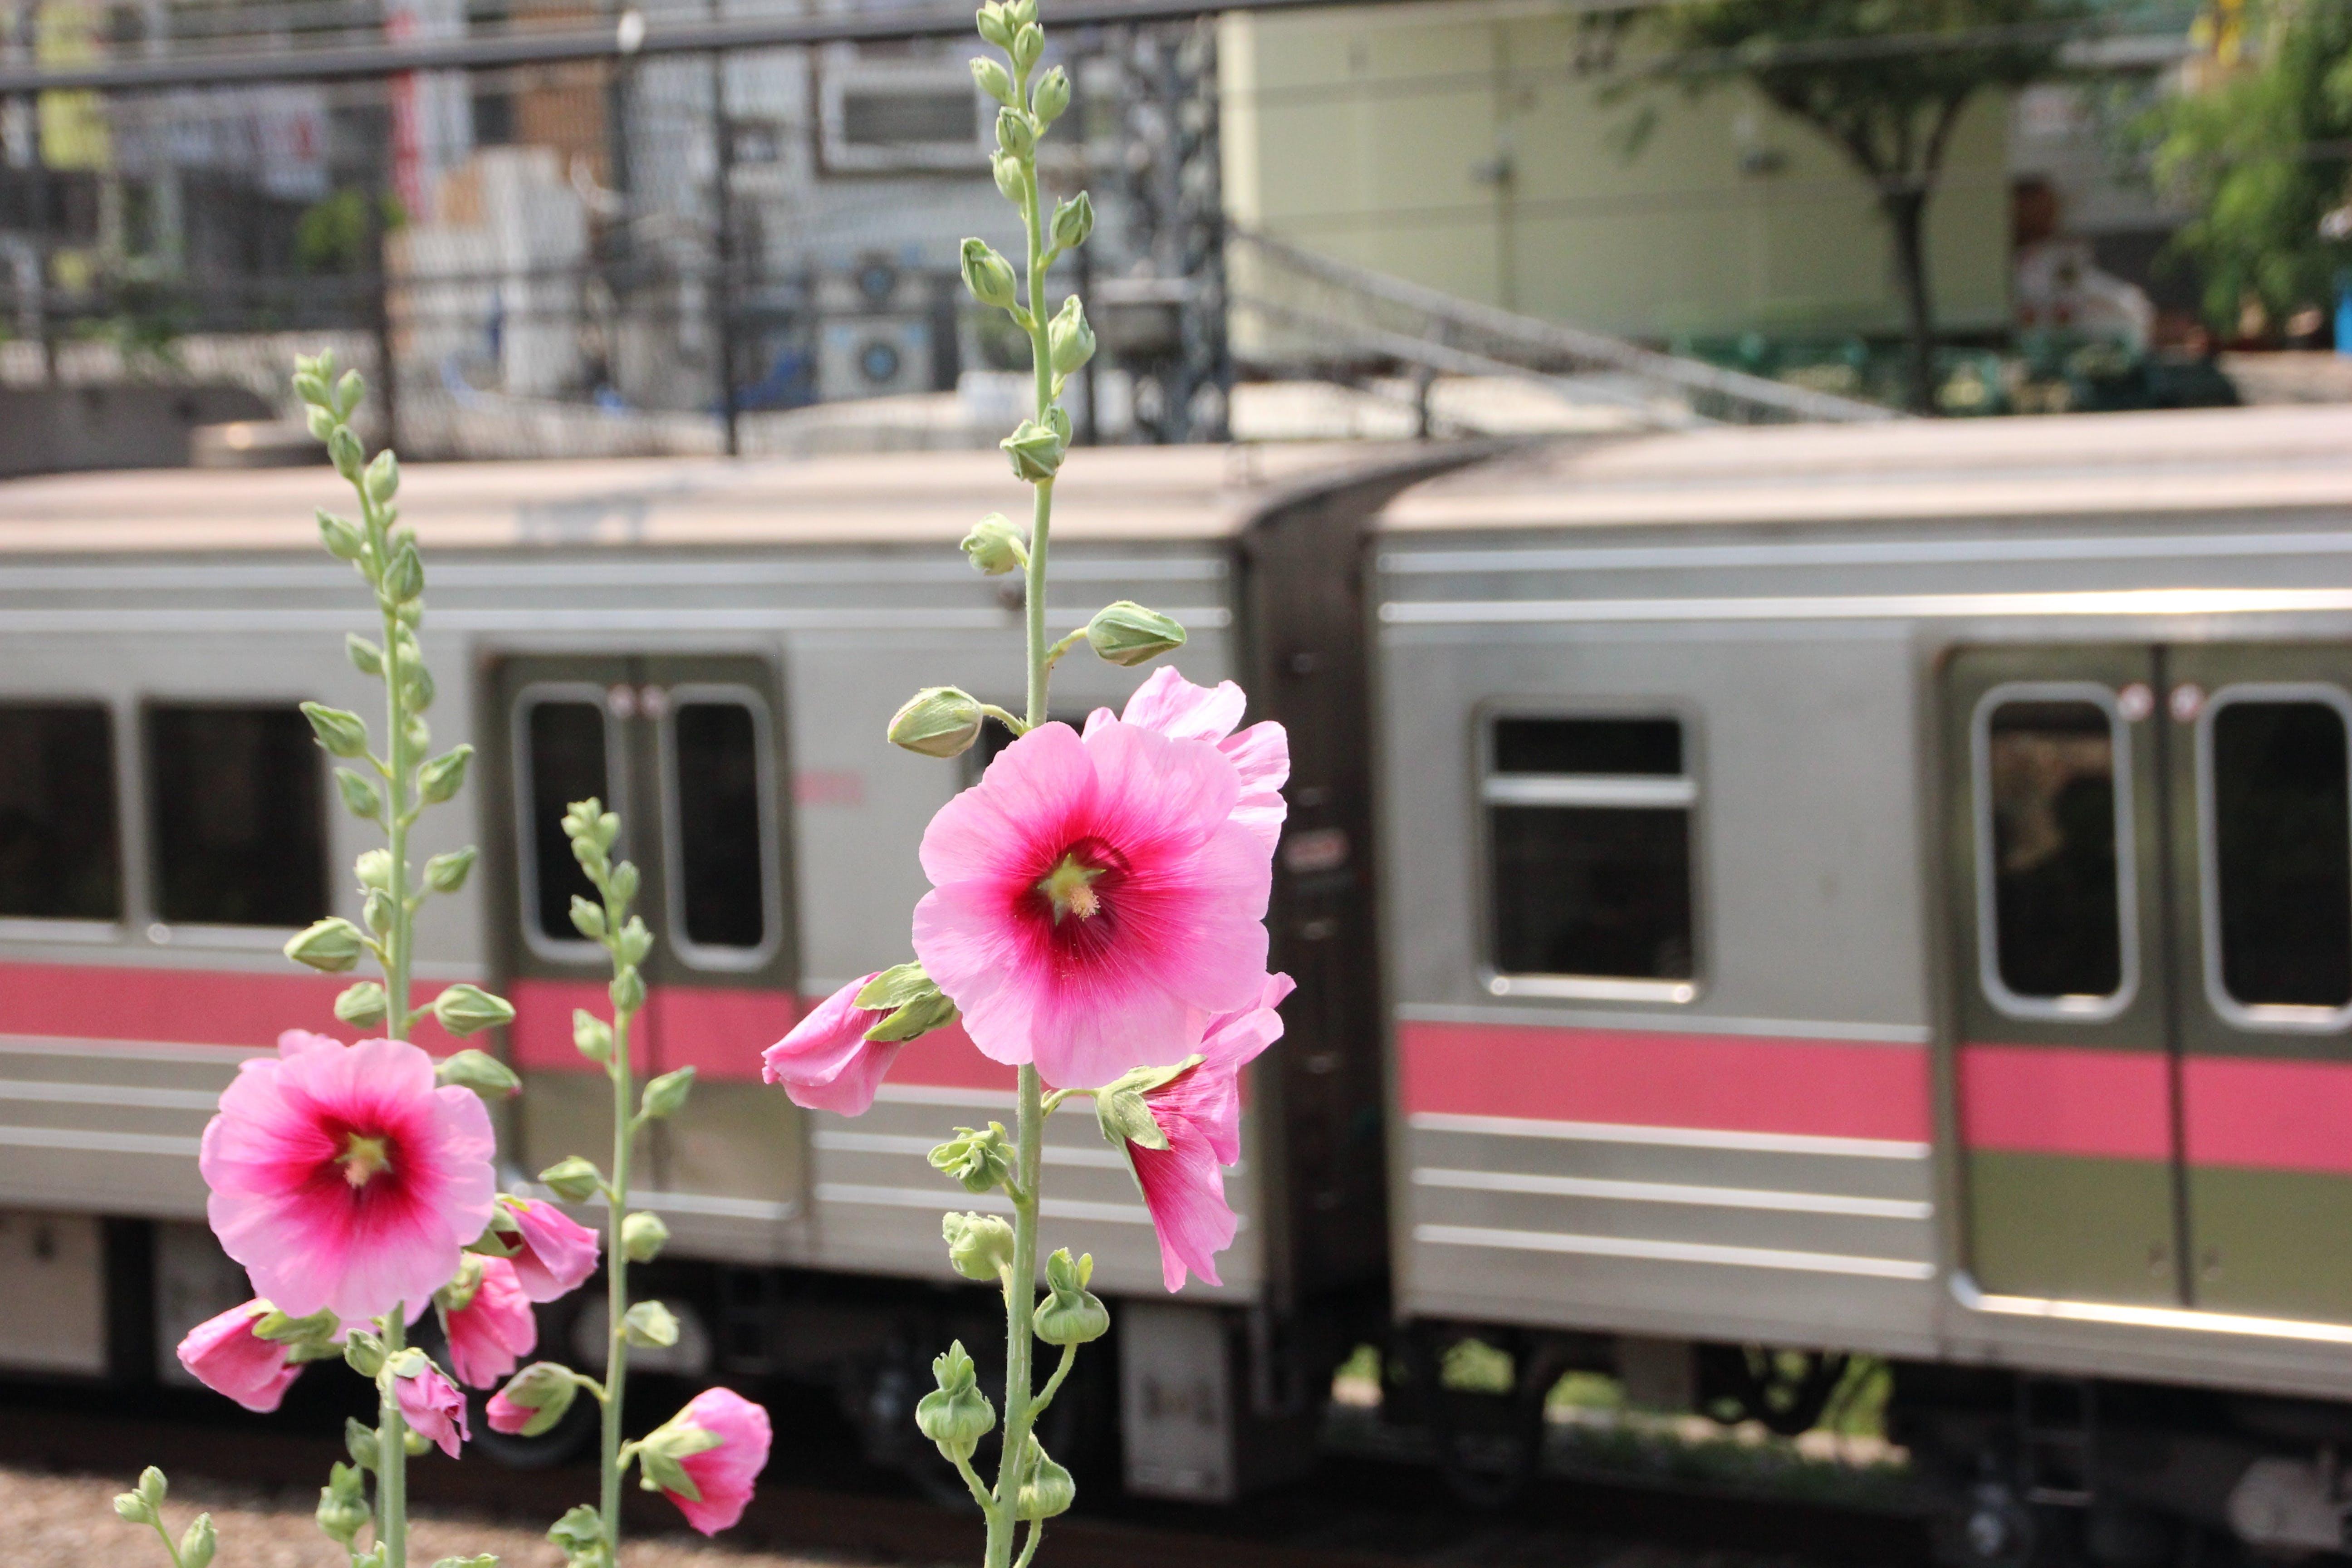 Free stock photo of flowers, train, flower, passenger